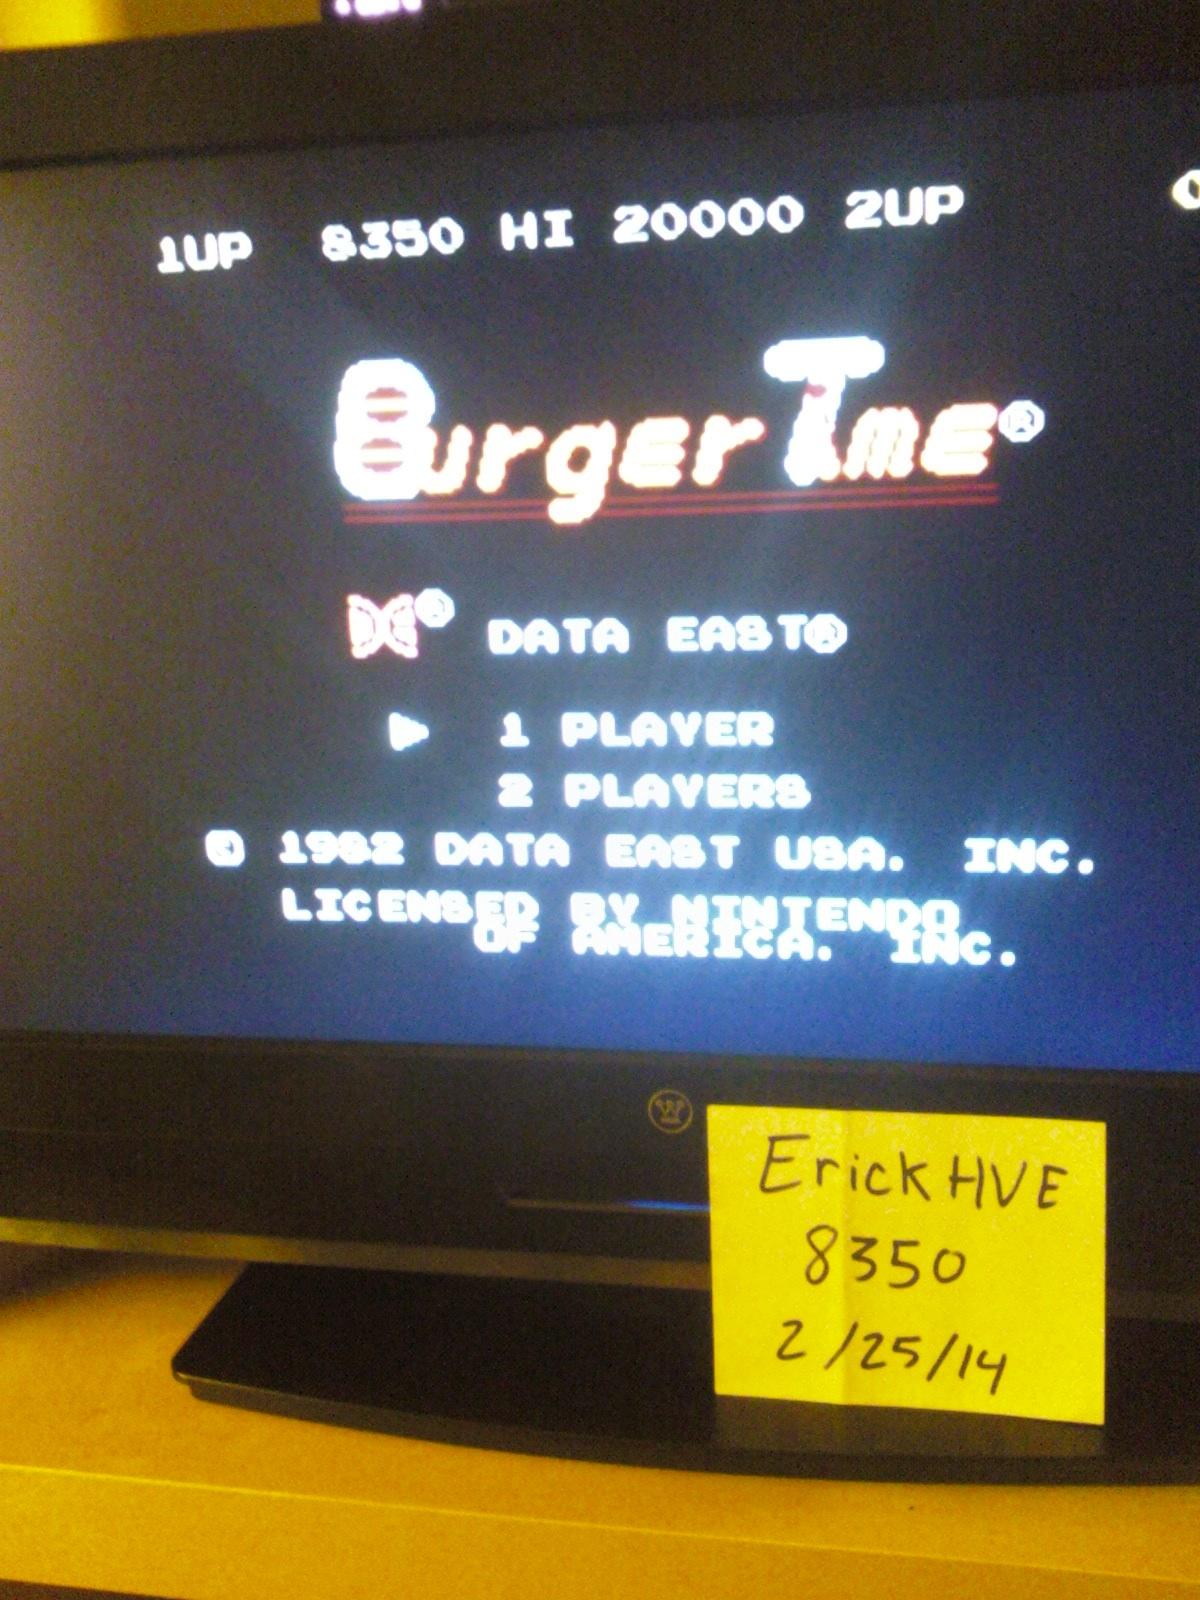 BurgerTime 8,350 points